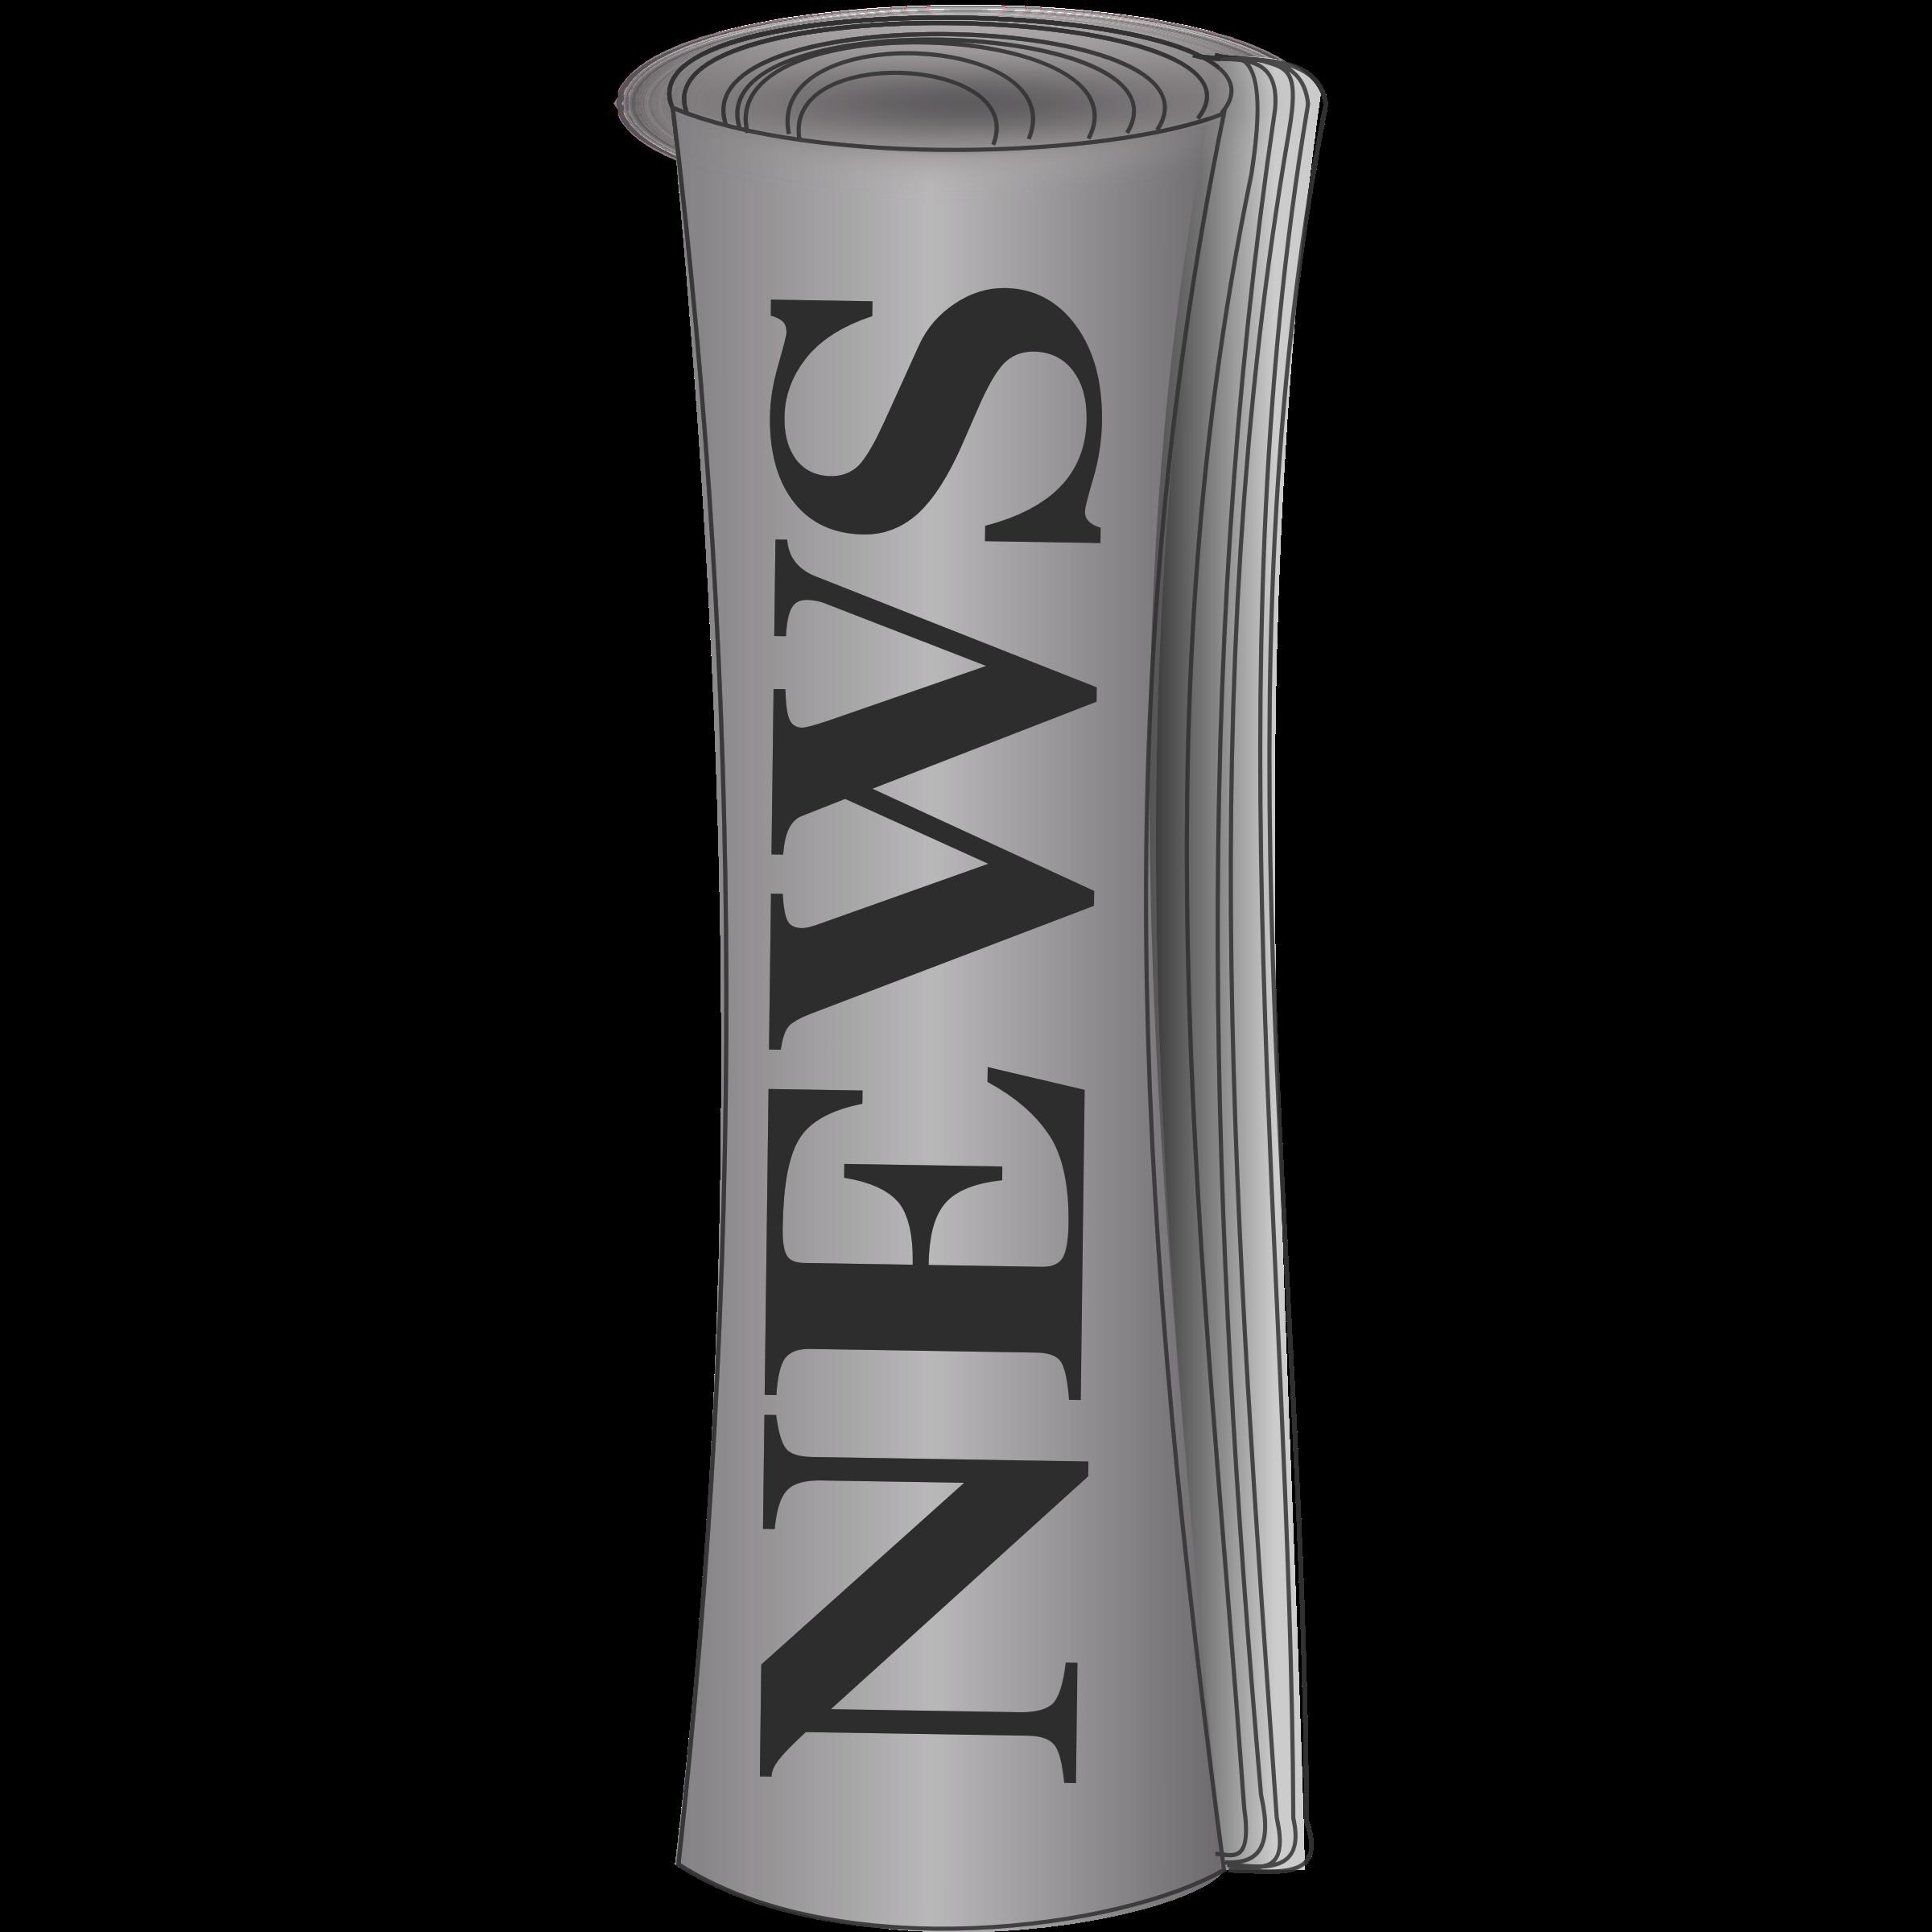 Clip art extra panda. News clipart rolled newspaper